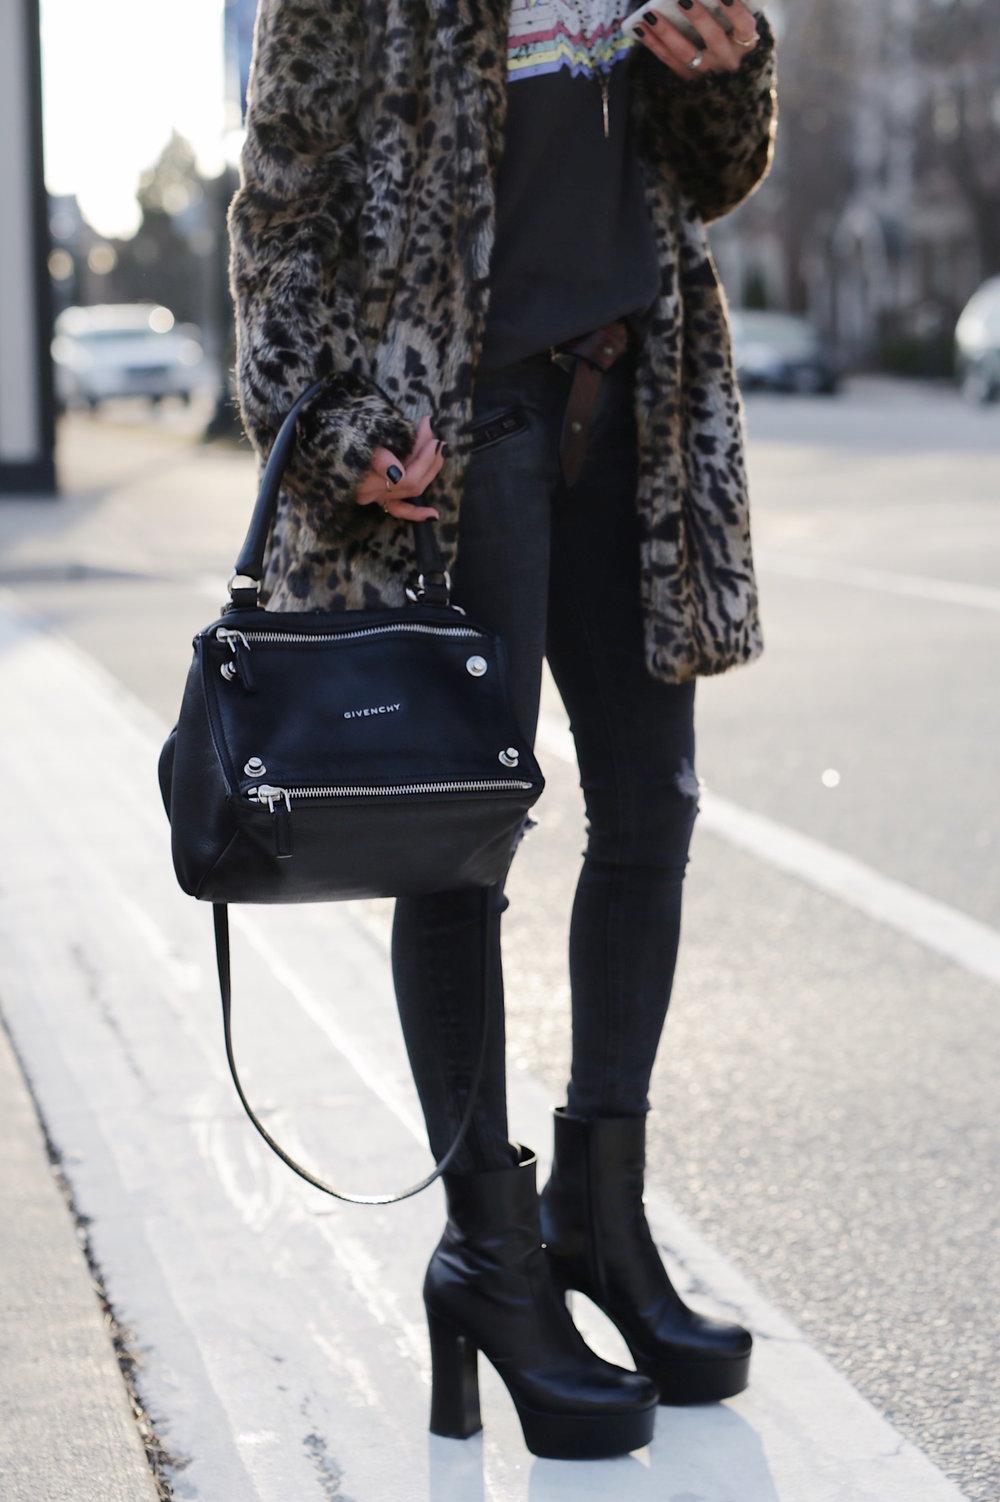 saint laurent black candy platform boots leopard print coat givenchy pandora isabel marant endless tshirt street style woahstyle.com_5703.JPG